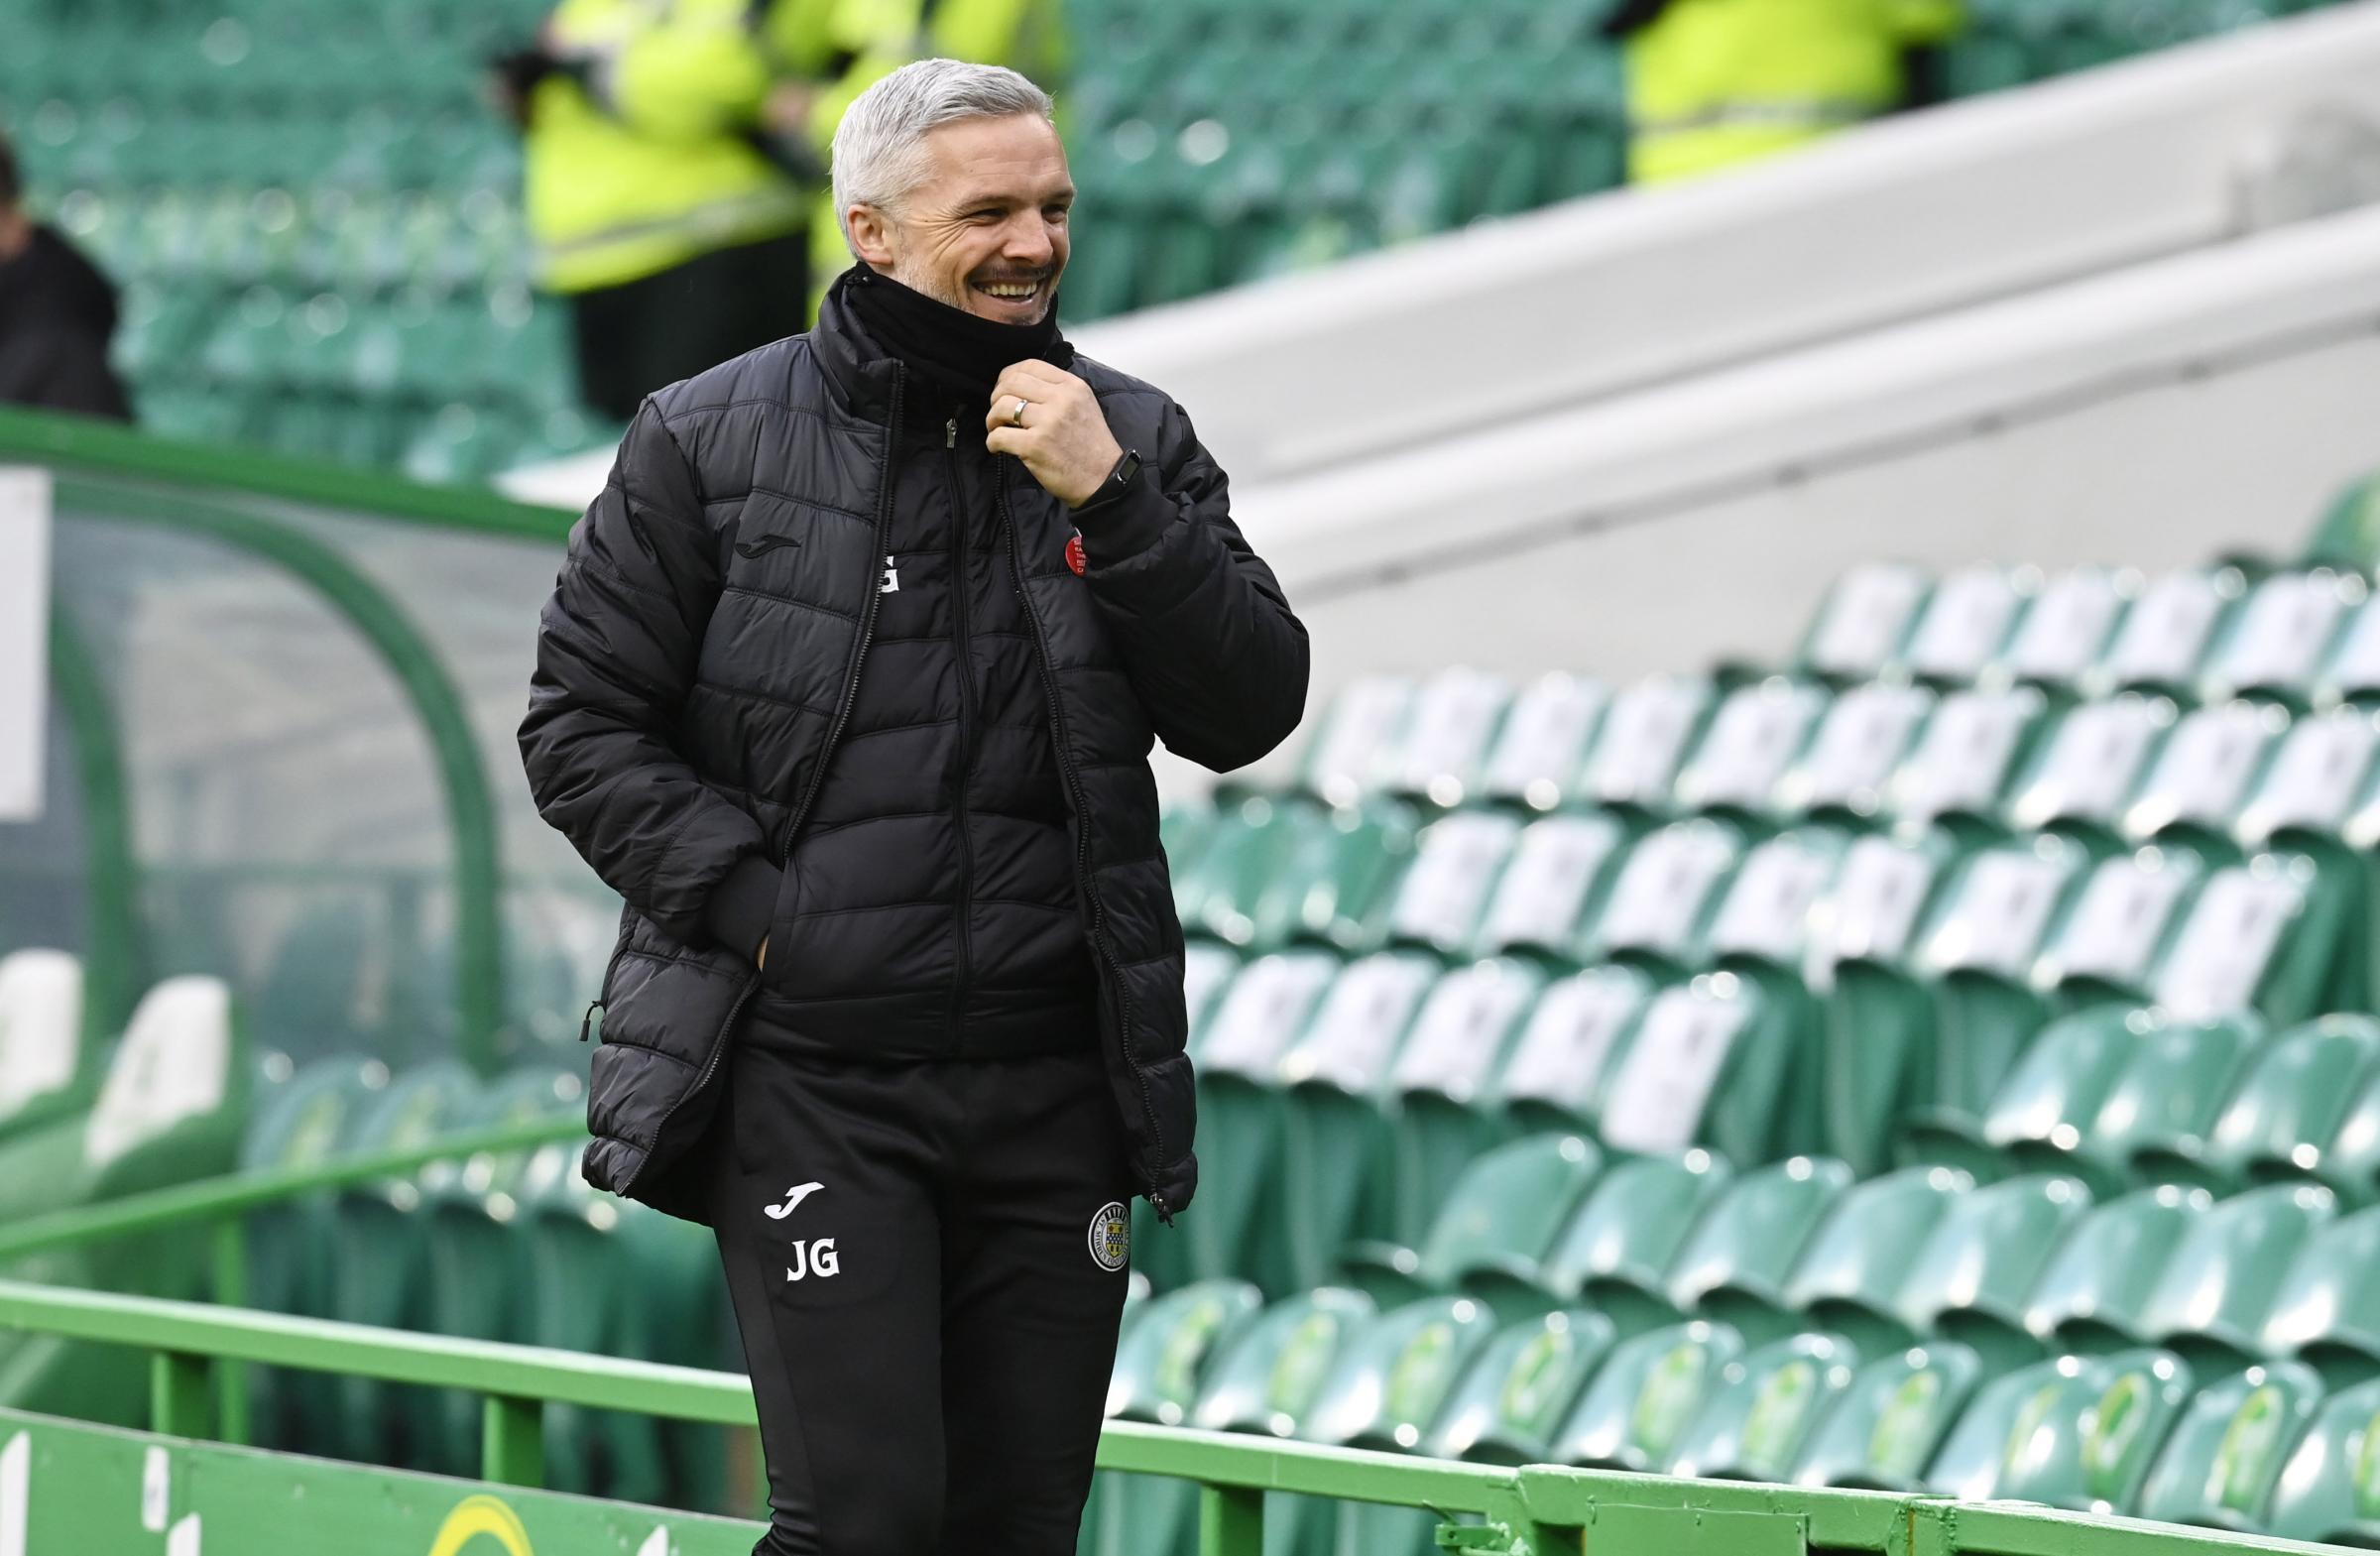 St Mirren boss Jim Goodwin dreaming of one day managing Ireland